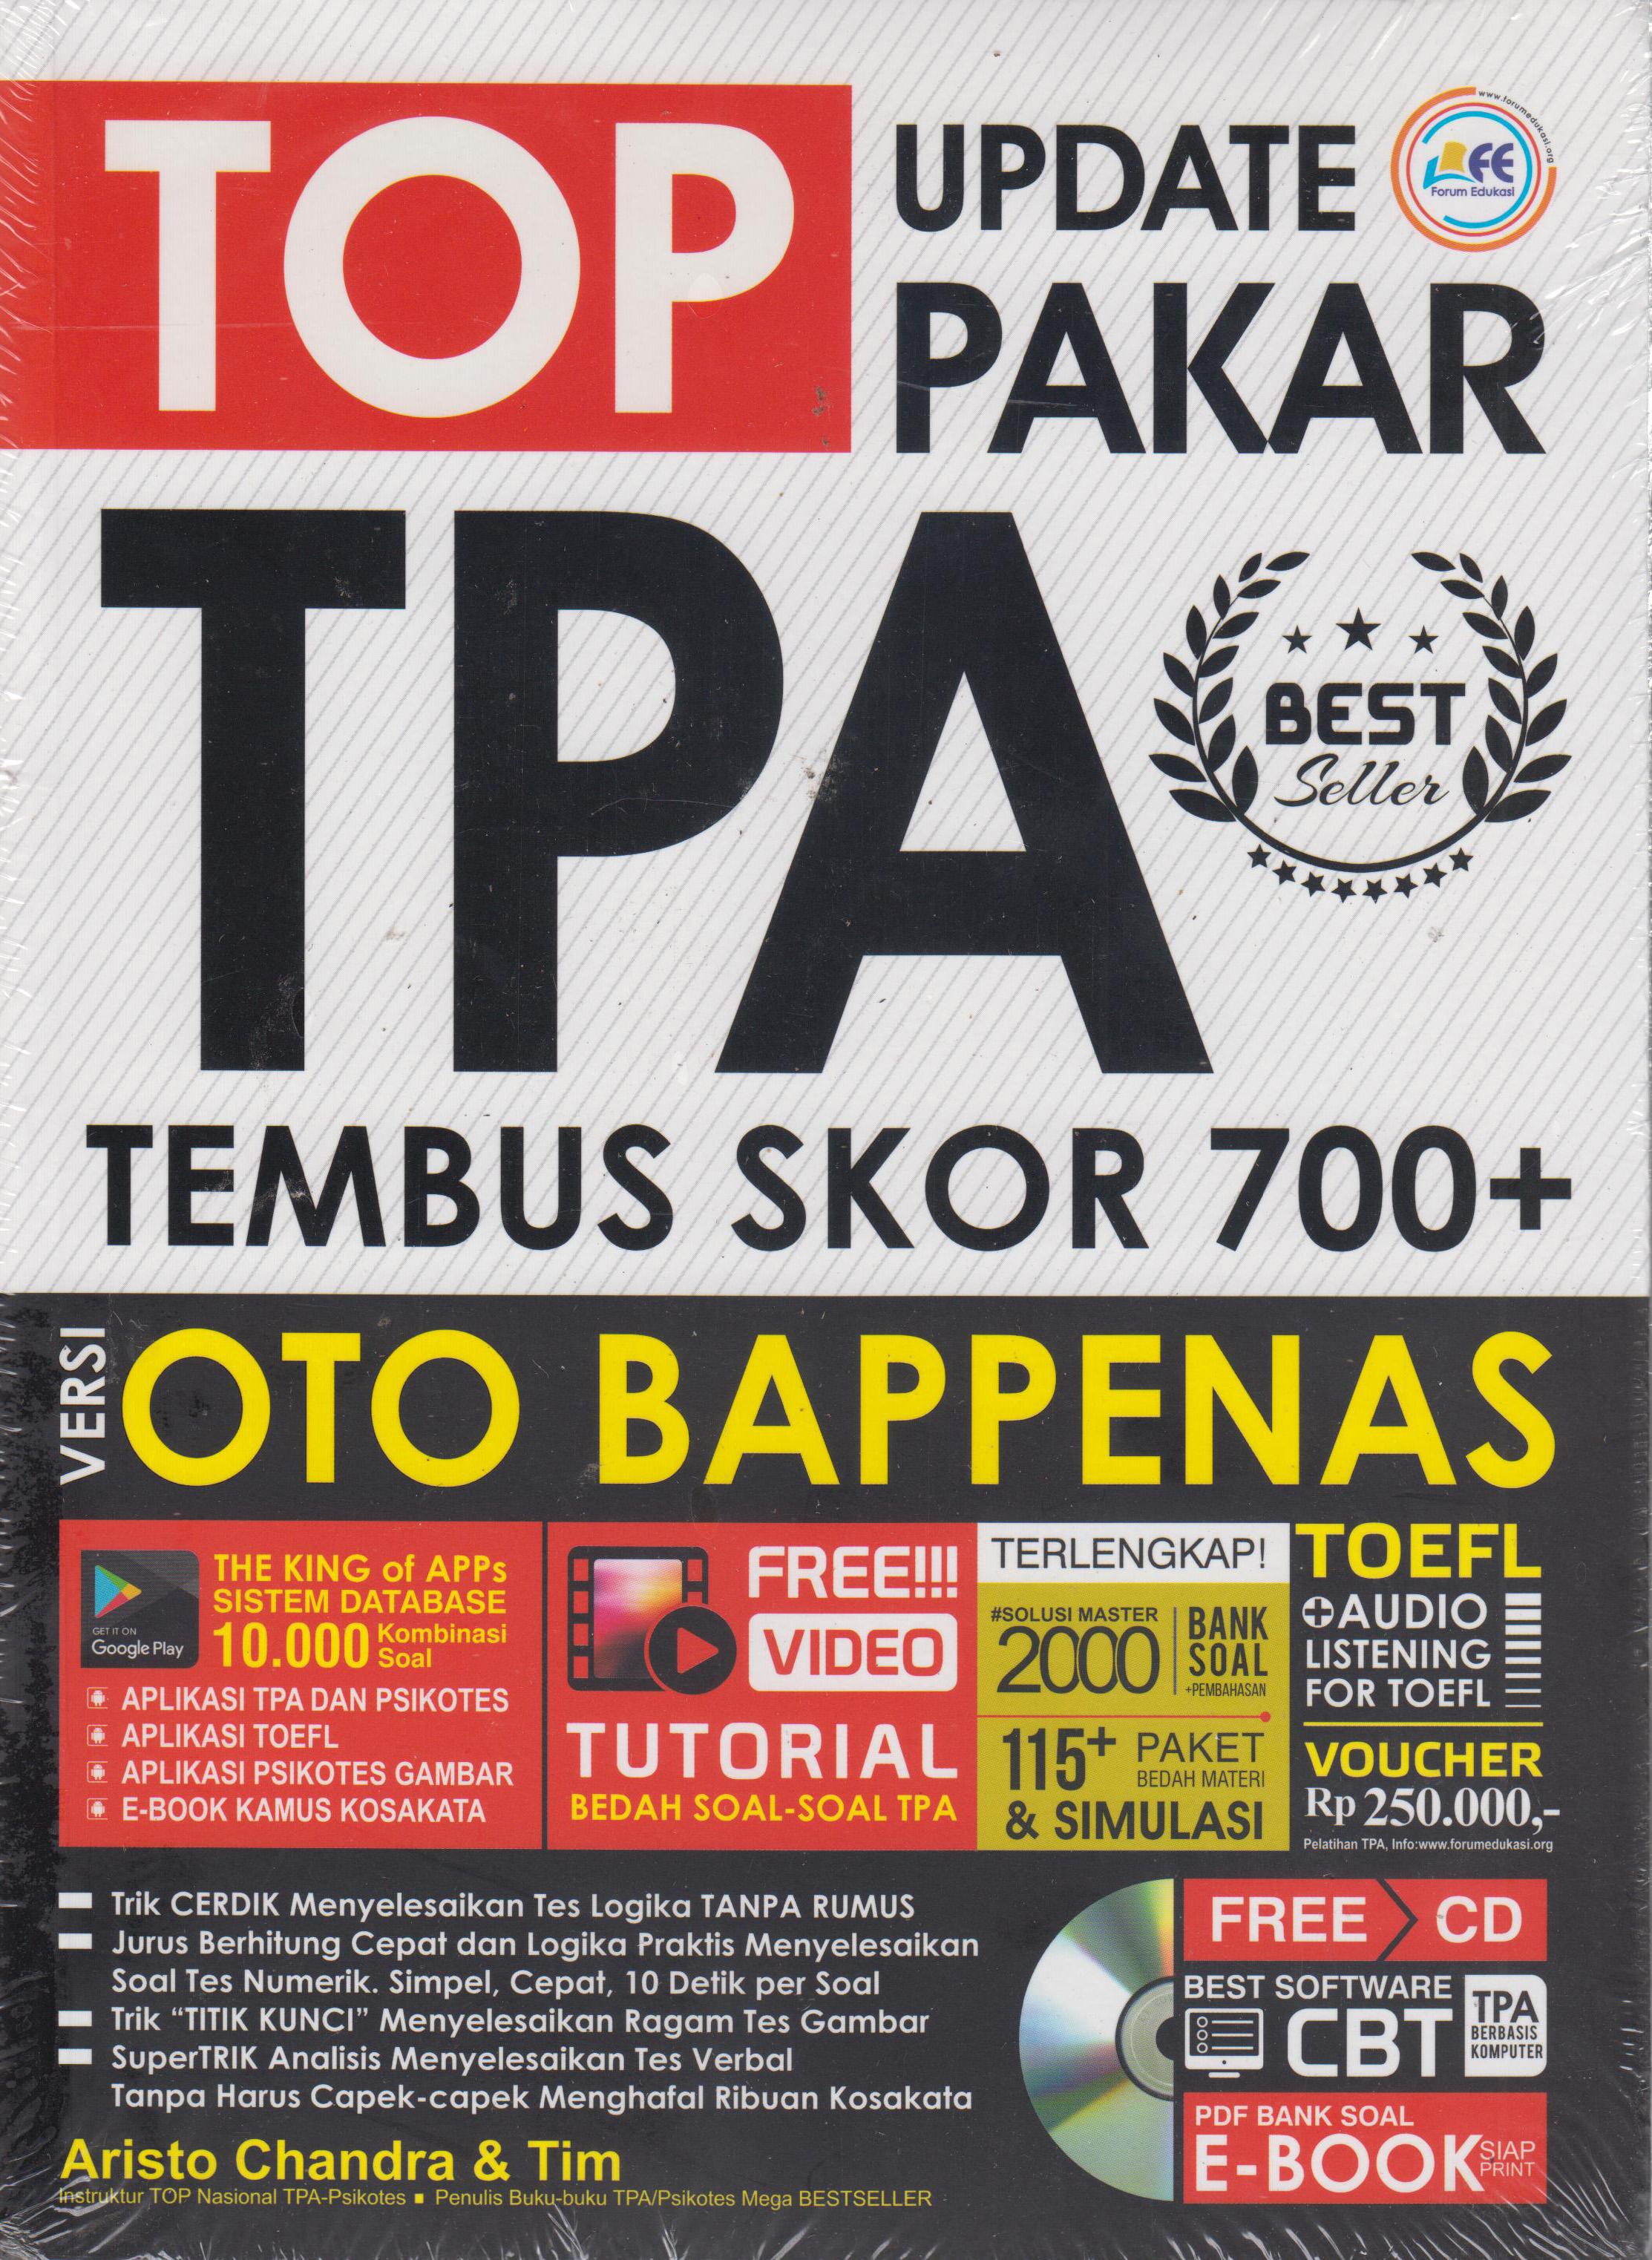 TOP UPDATE PAKAR TPA TEMBUS SKOR 700+ VERSI OTO BA en